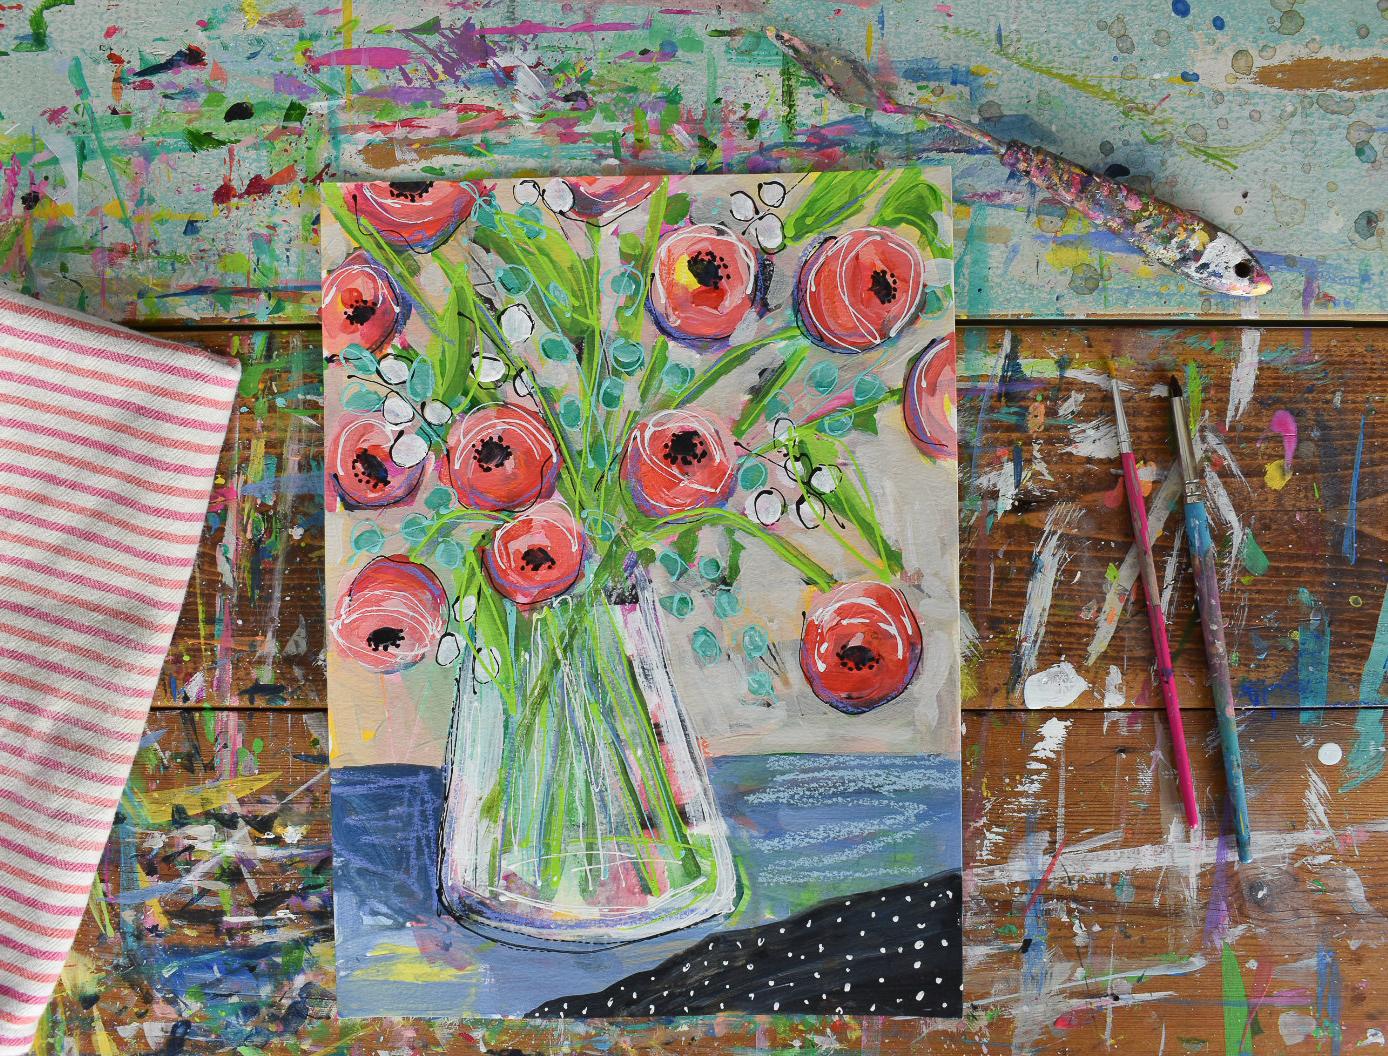 boho_flowers_painting_daisyfaithart_4.jpg